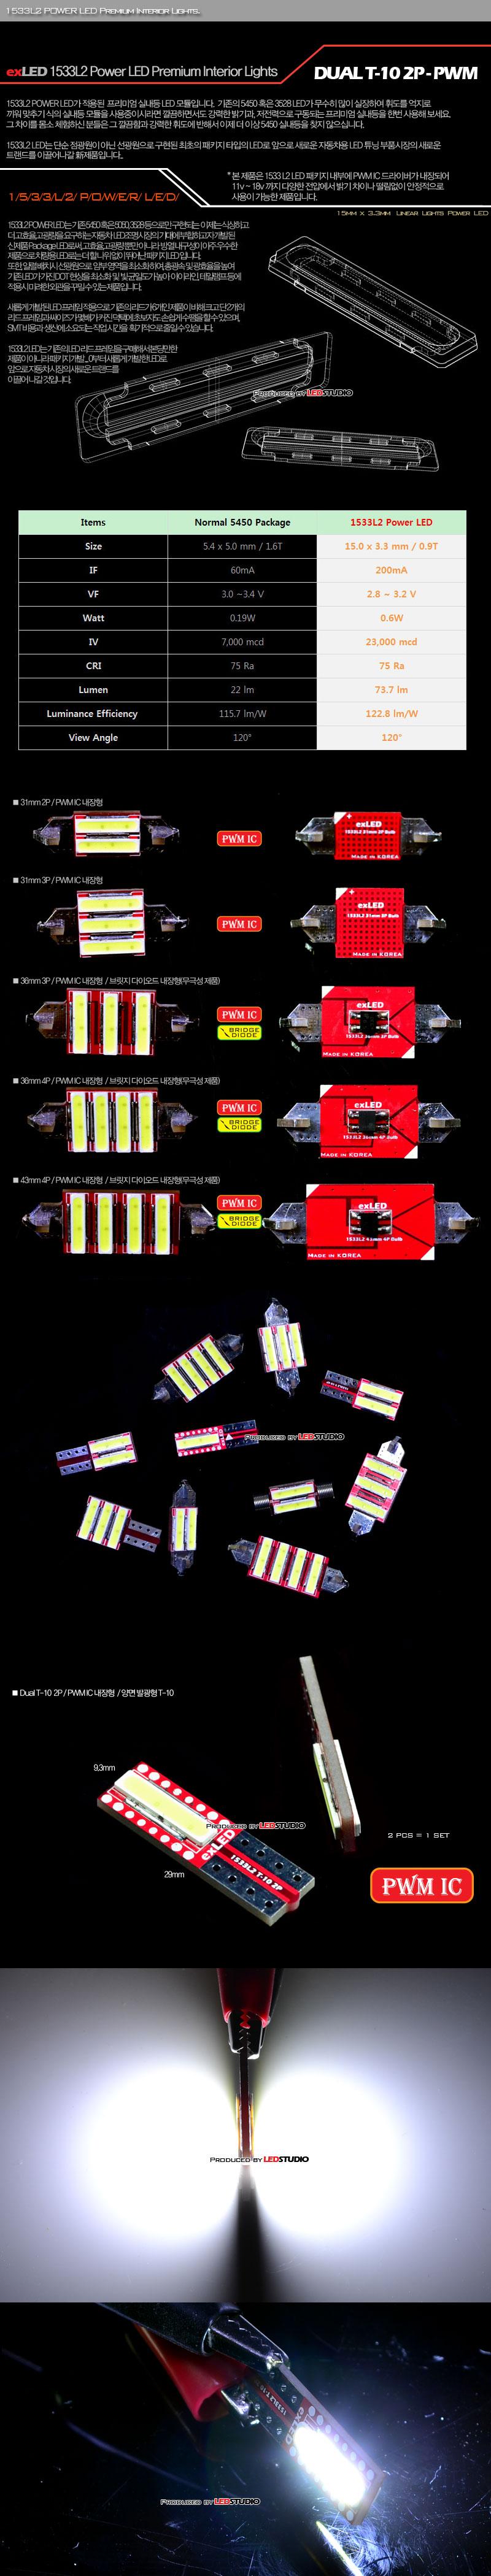 exLED 1533L2파워LED 프리미엄 공용 벌브 양면형 T-10 2P PWM (무저항 IC 내장형) (2개 1조)